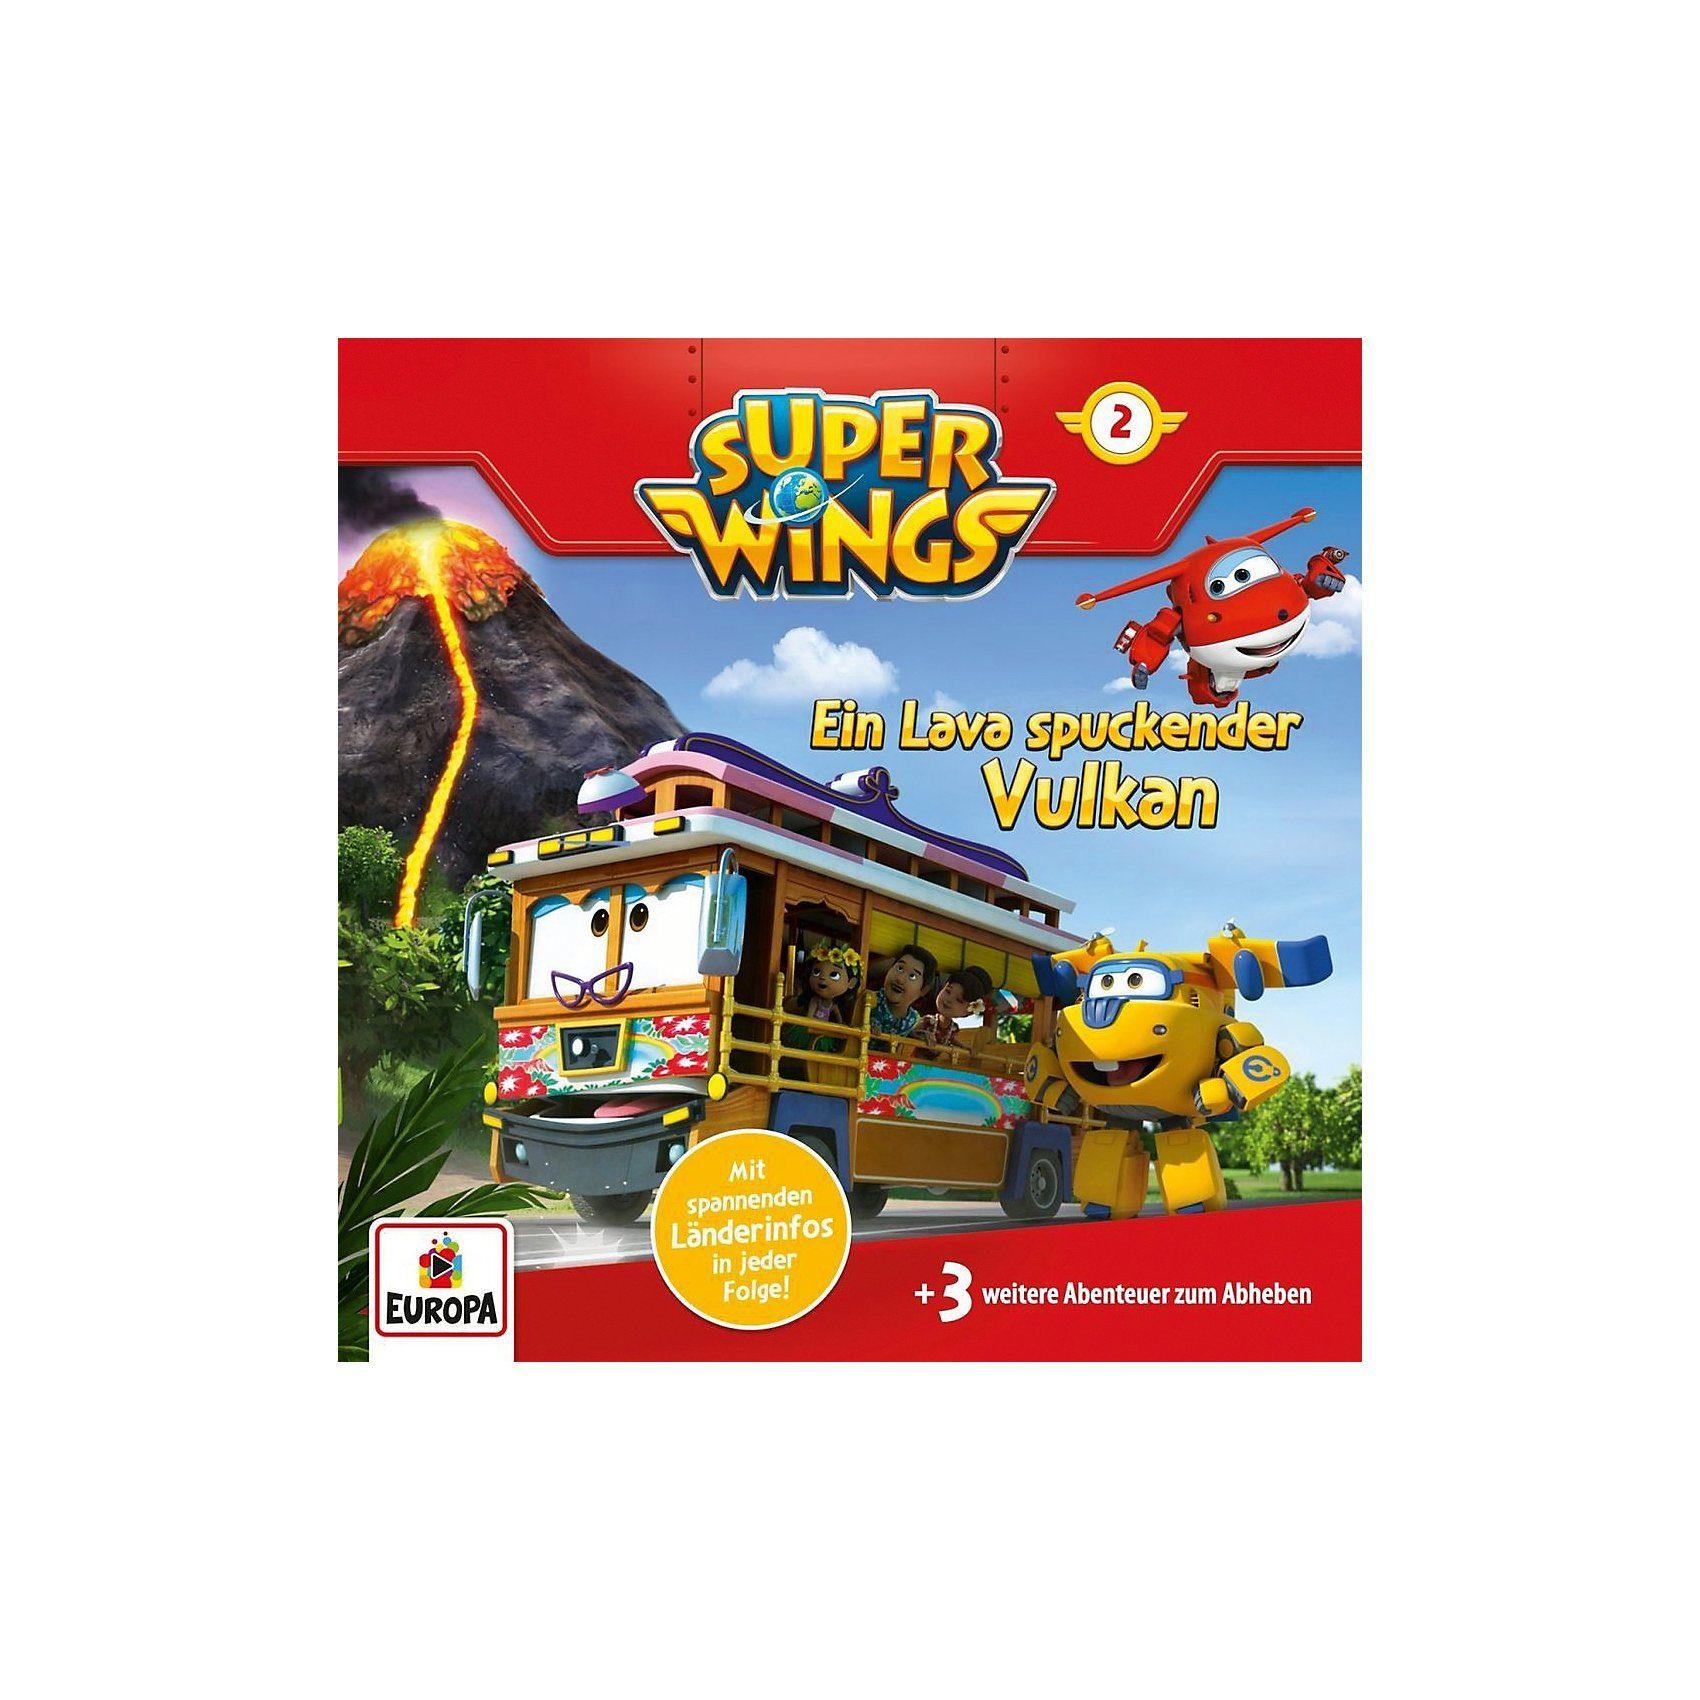 CD Super Wings 2 - Ein Lava spuckender Vulkan